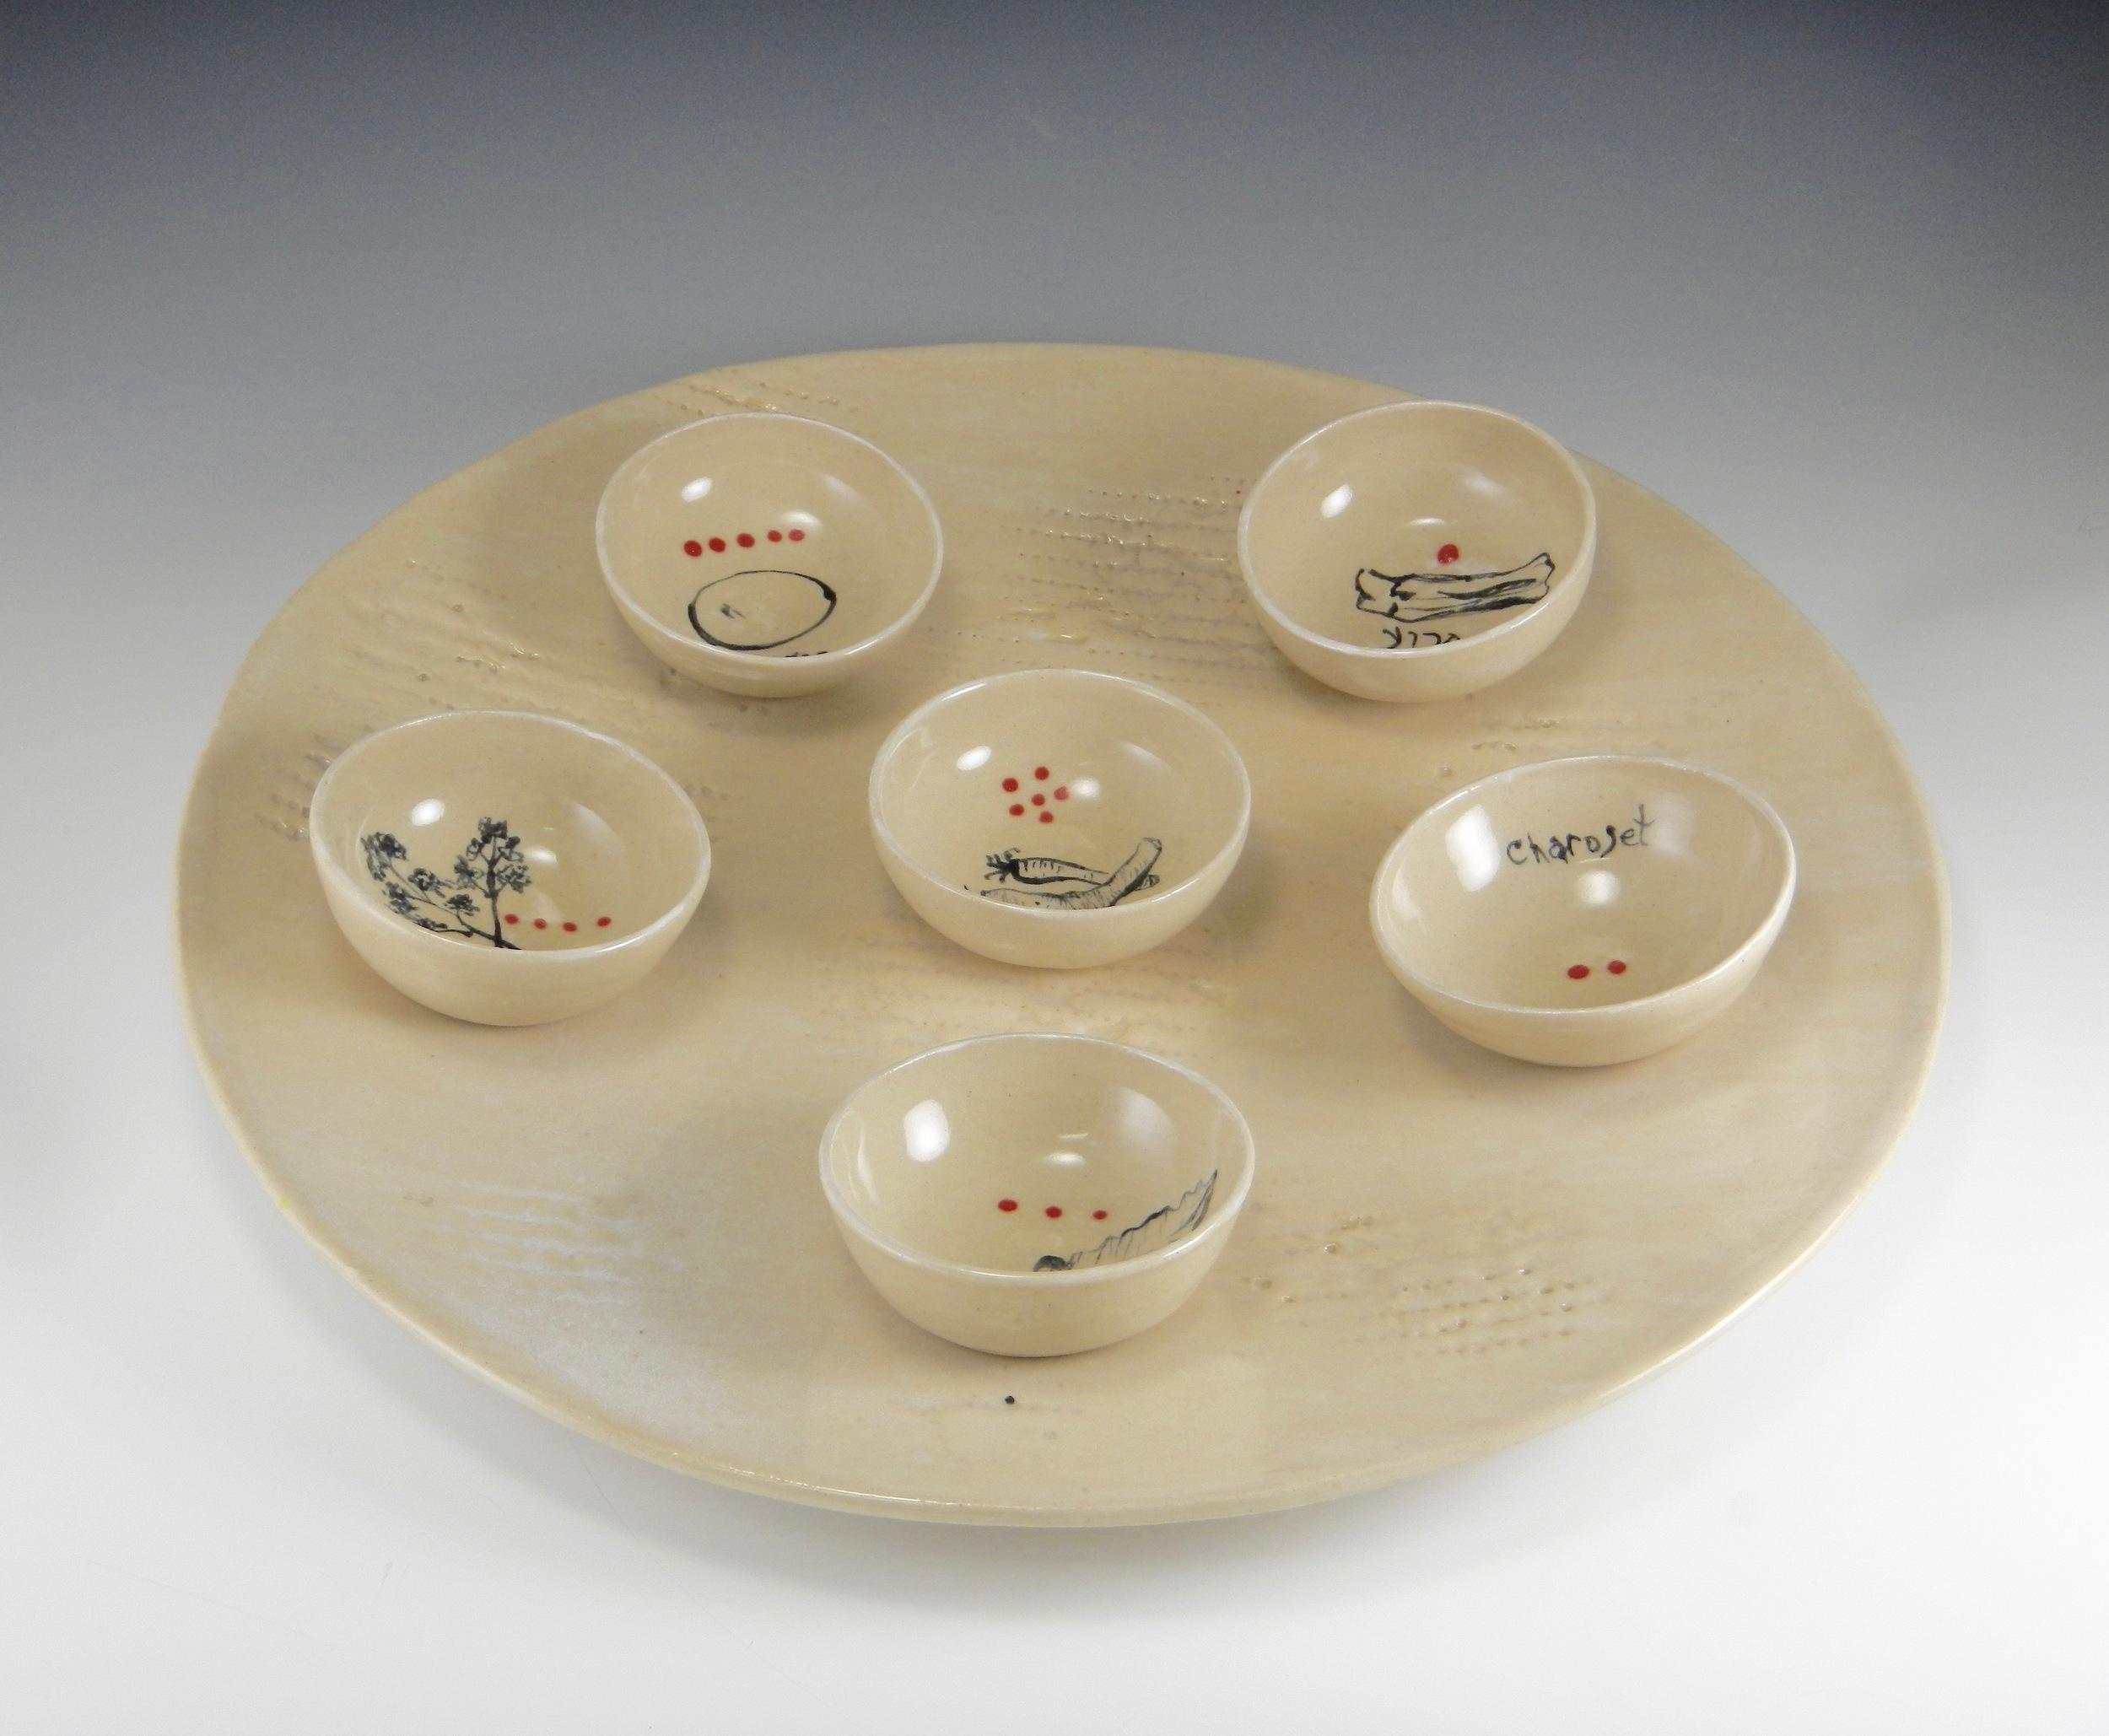 "(Seder Plate, 17"" in diameter, handbuilt, wheel-thrown, textured and freely drawn. 2016 Mimi Stadler Pottery)"